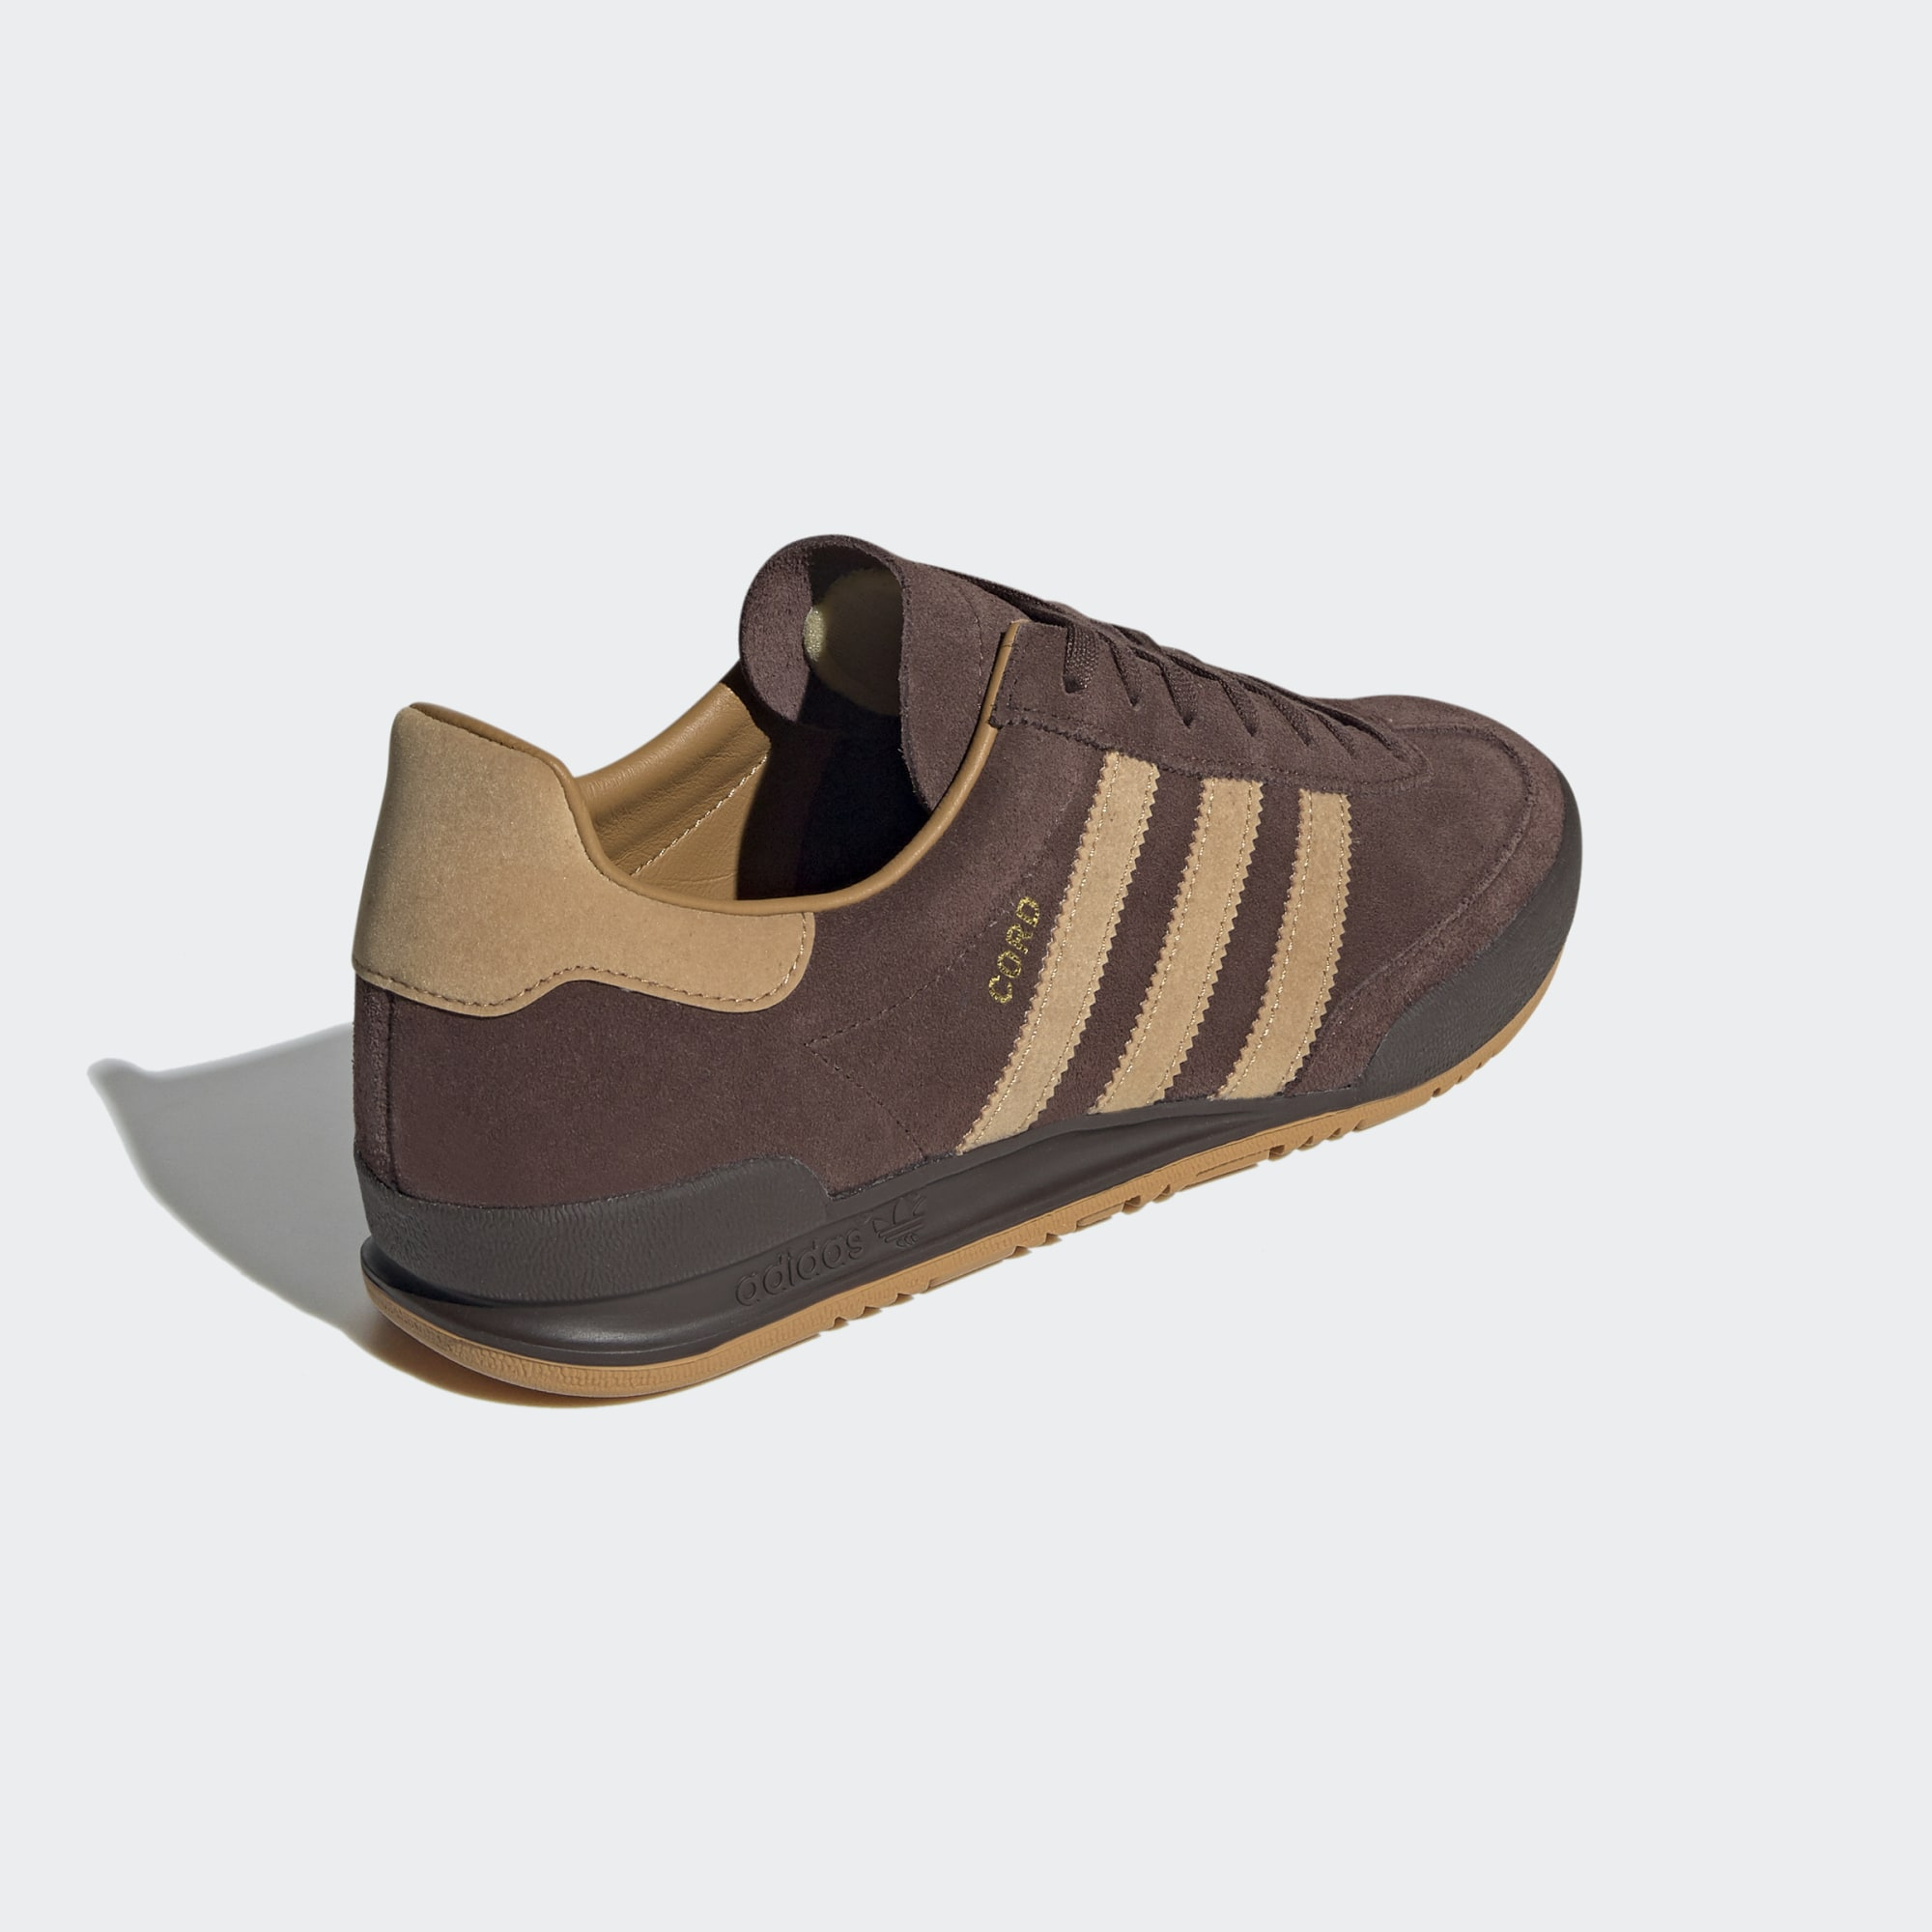 Cord_Shoes_Brun_H67630_05_standard.jpg